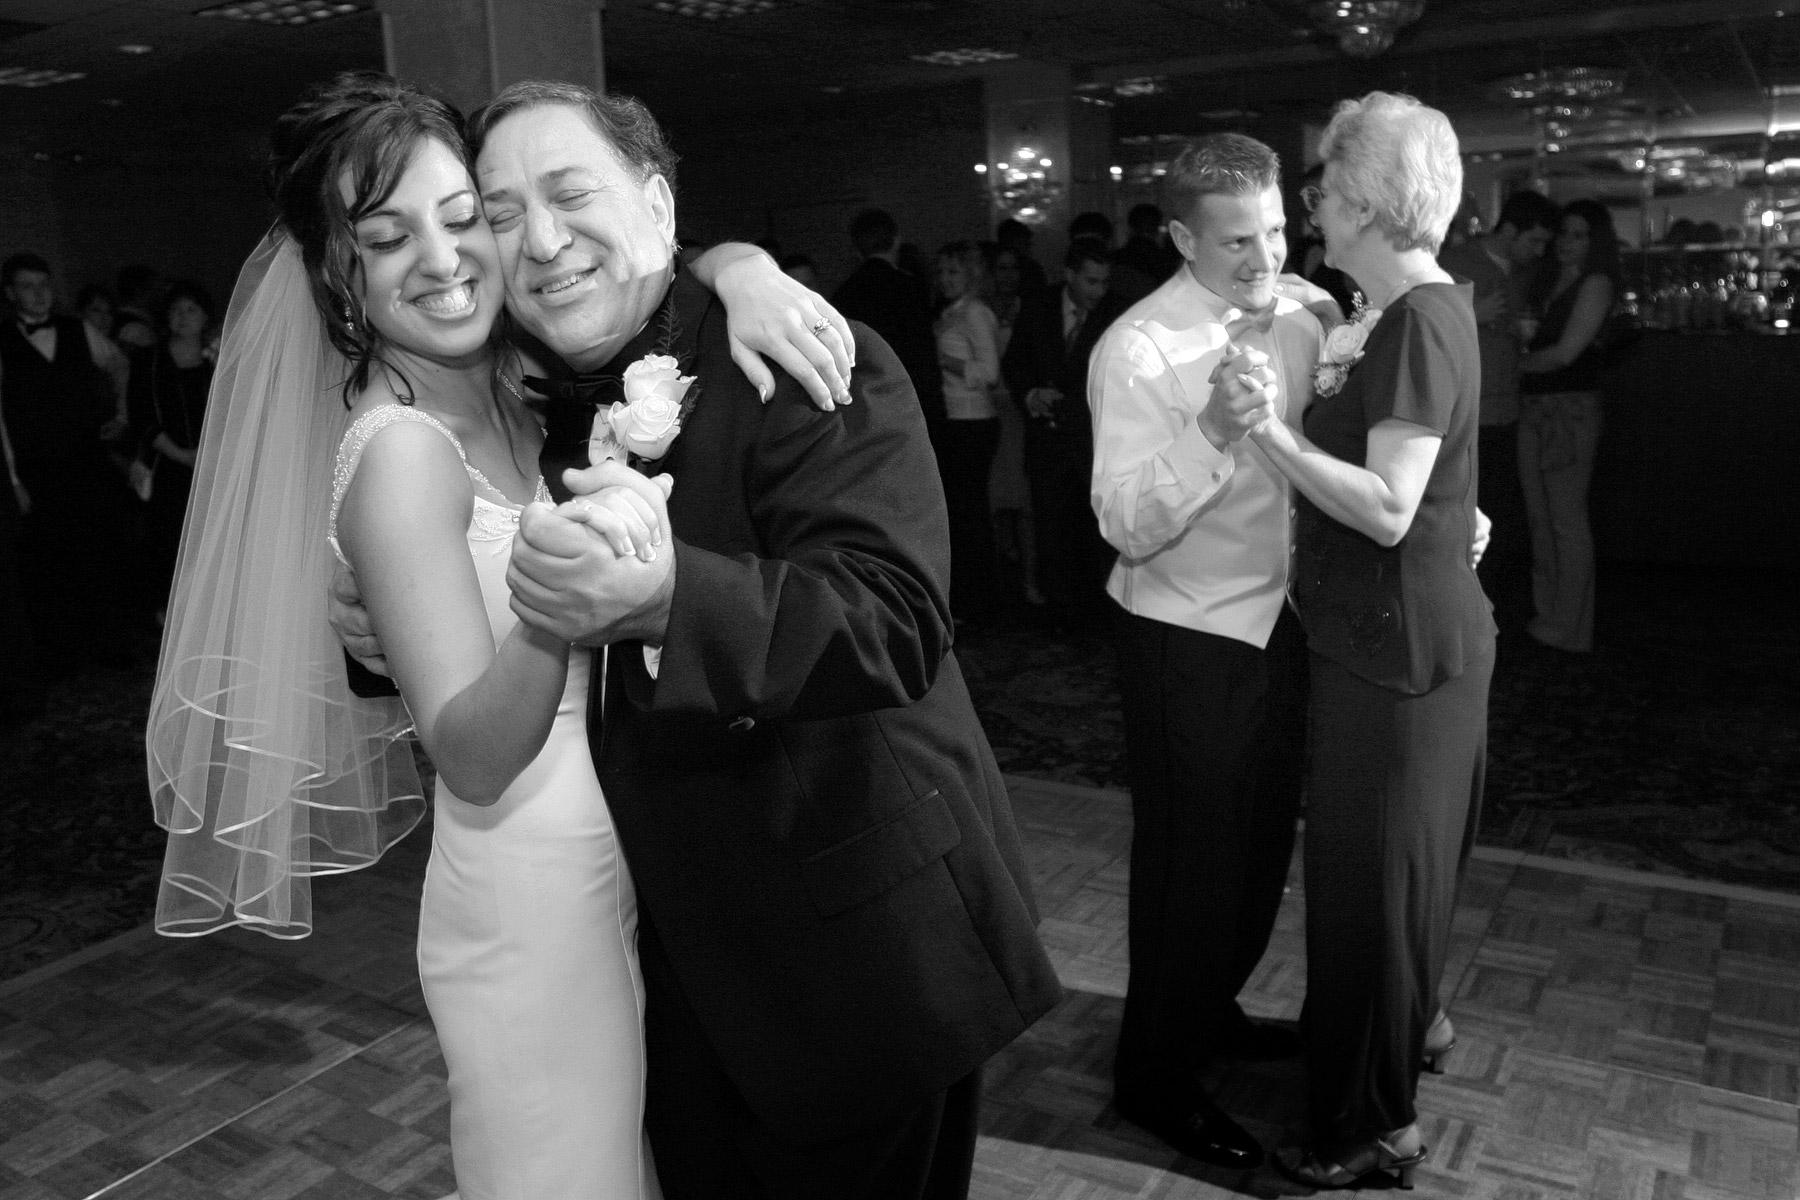 wedding-photography-saint-paul-mark-kegans-636.jpg